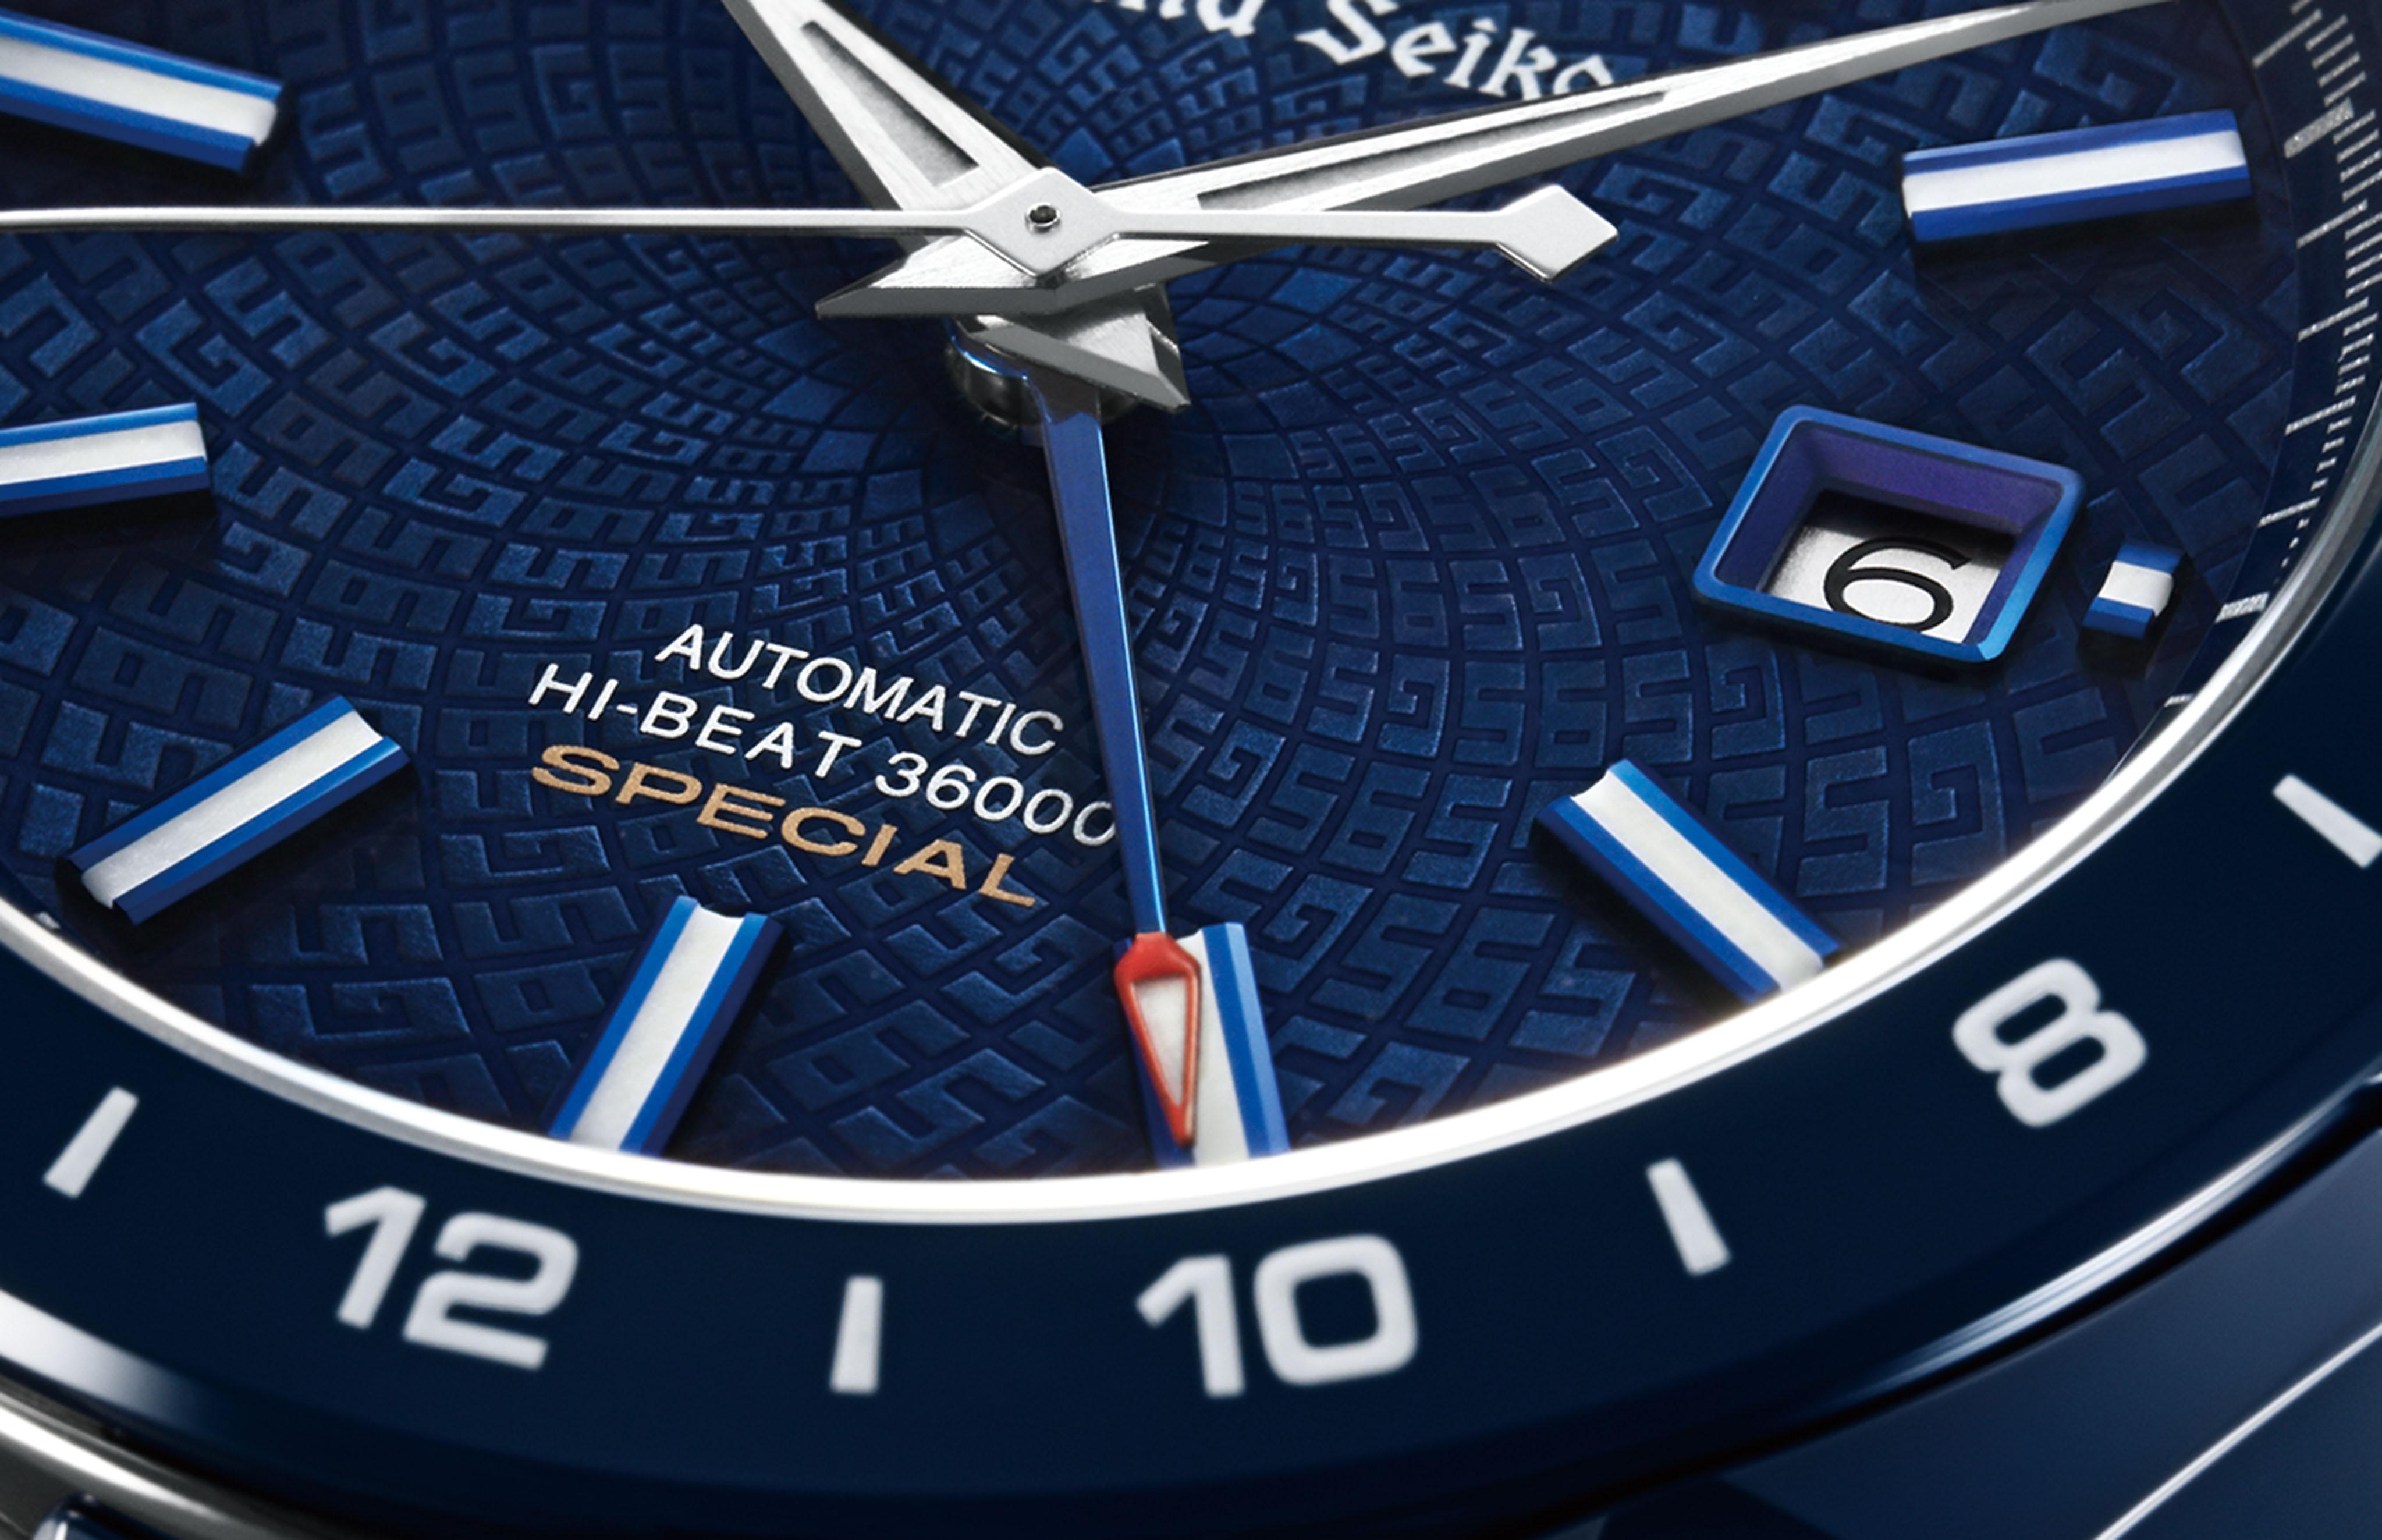 Grand Seiko Blue Ceramic Hi-Beat GMT Special Limited Edition SBGJ229